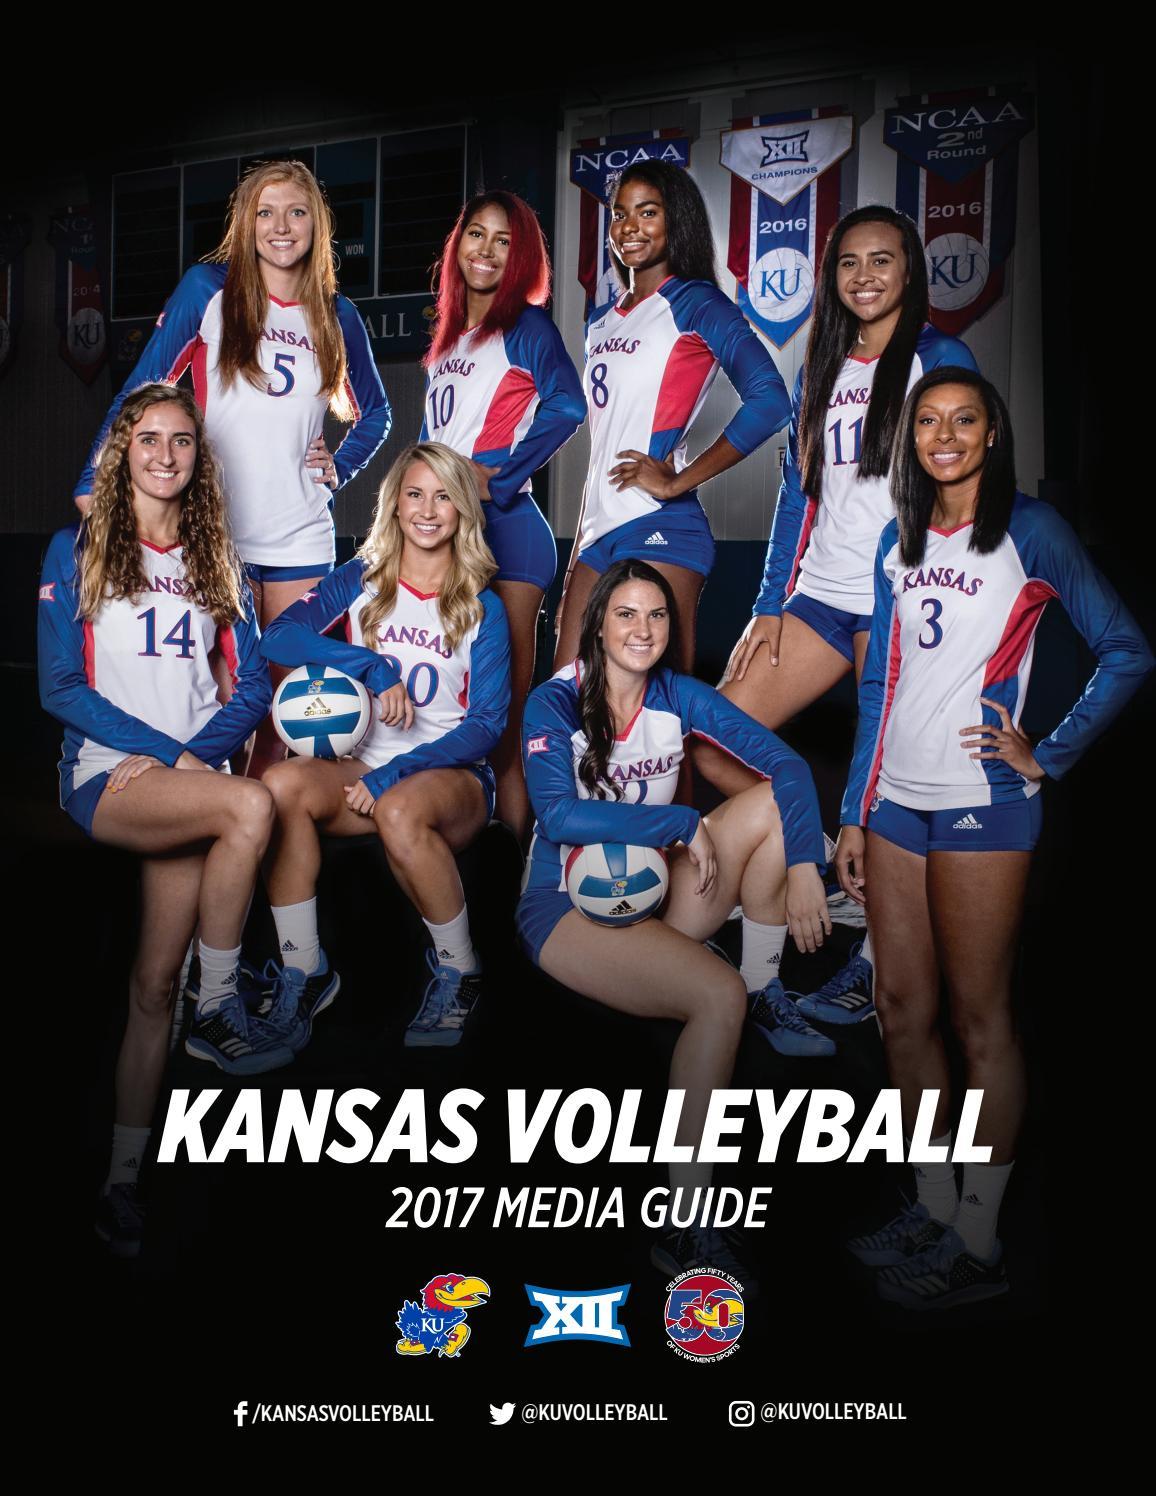 df4b3fe2a 2017 Kansas Volleyball Media Guide by Kansas Athletics - issuu